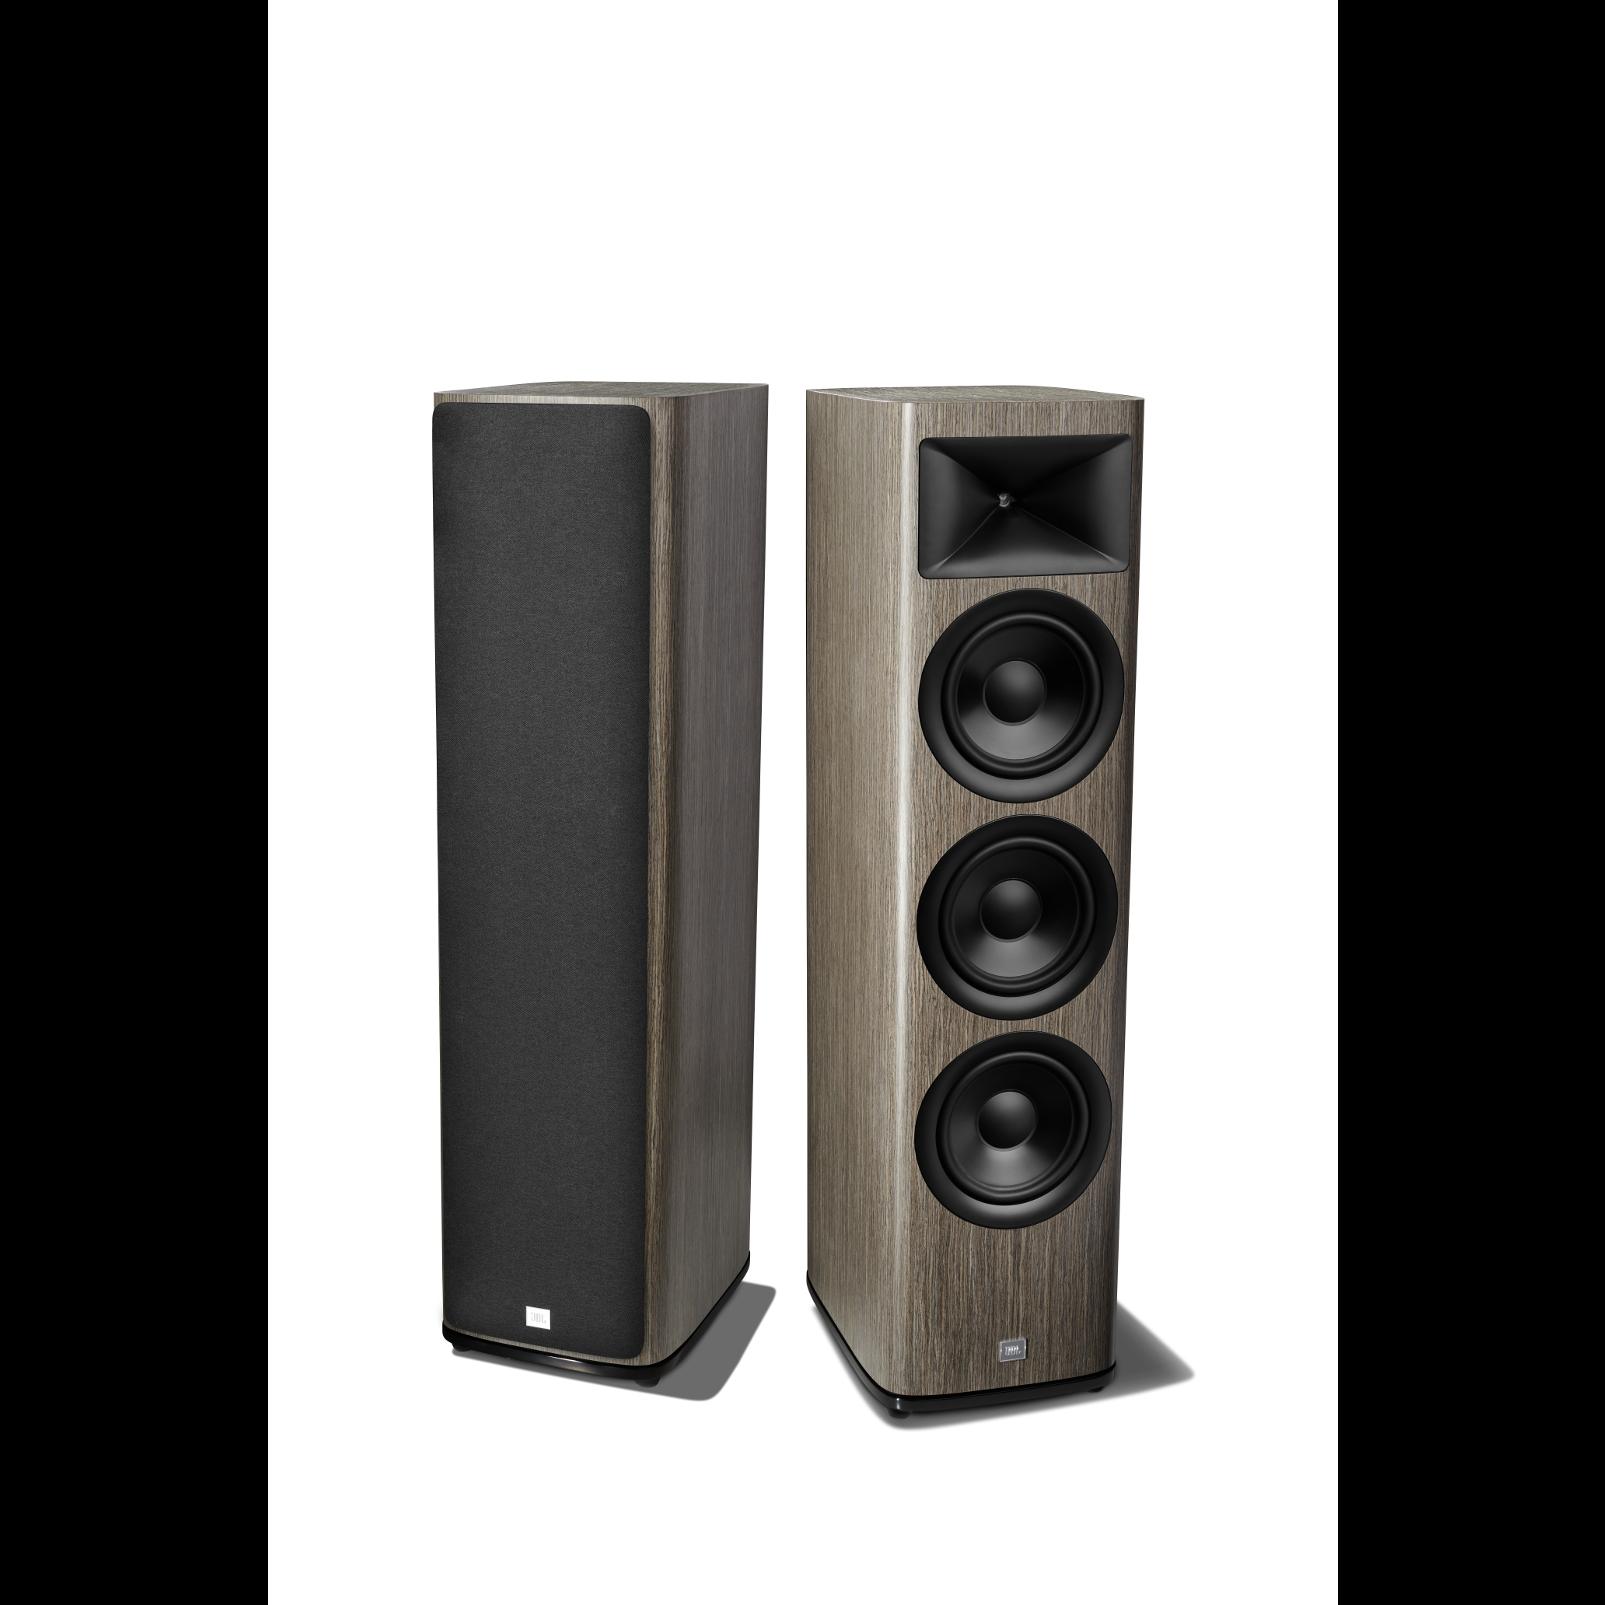 HDI-3800 - Grey Oak - 2 ½-way Triple 8-inch (200mm) Floorstanding Loudspeaker - Detailshot 1